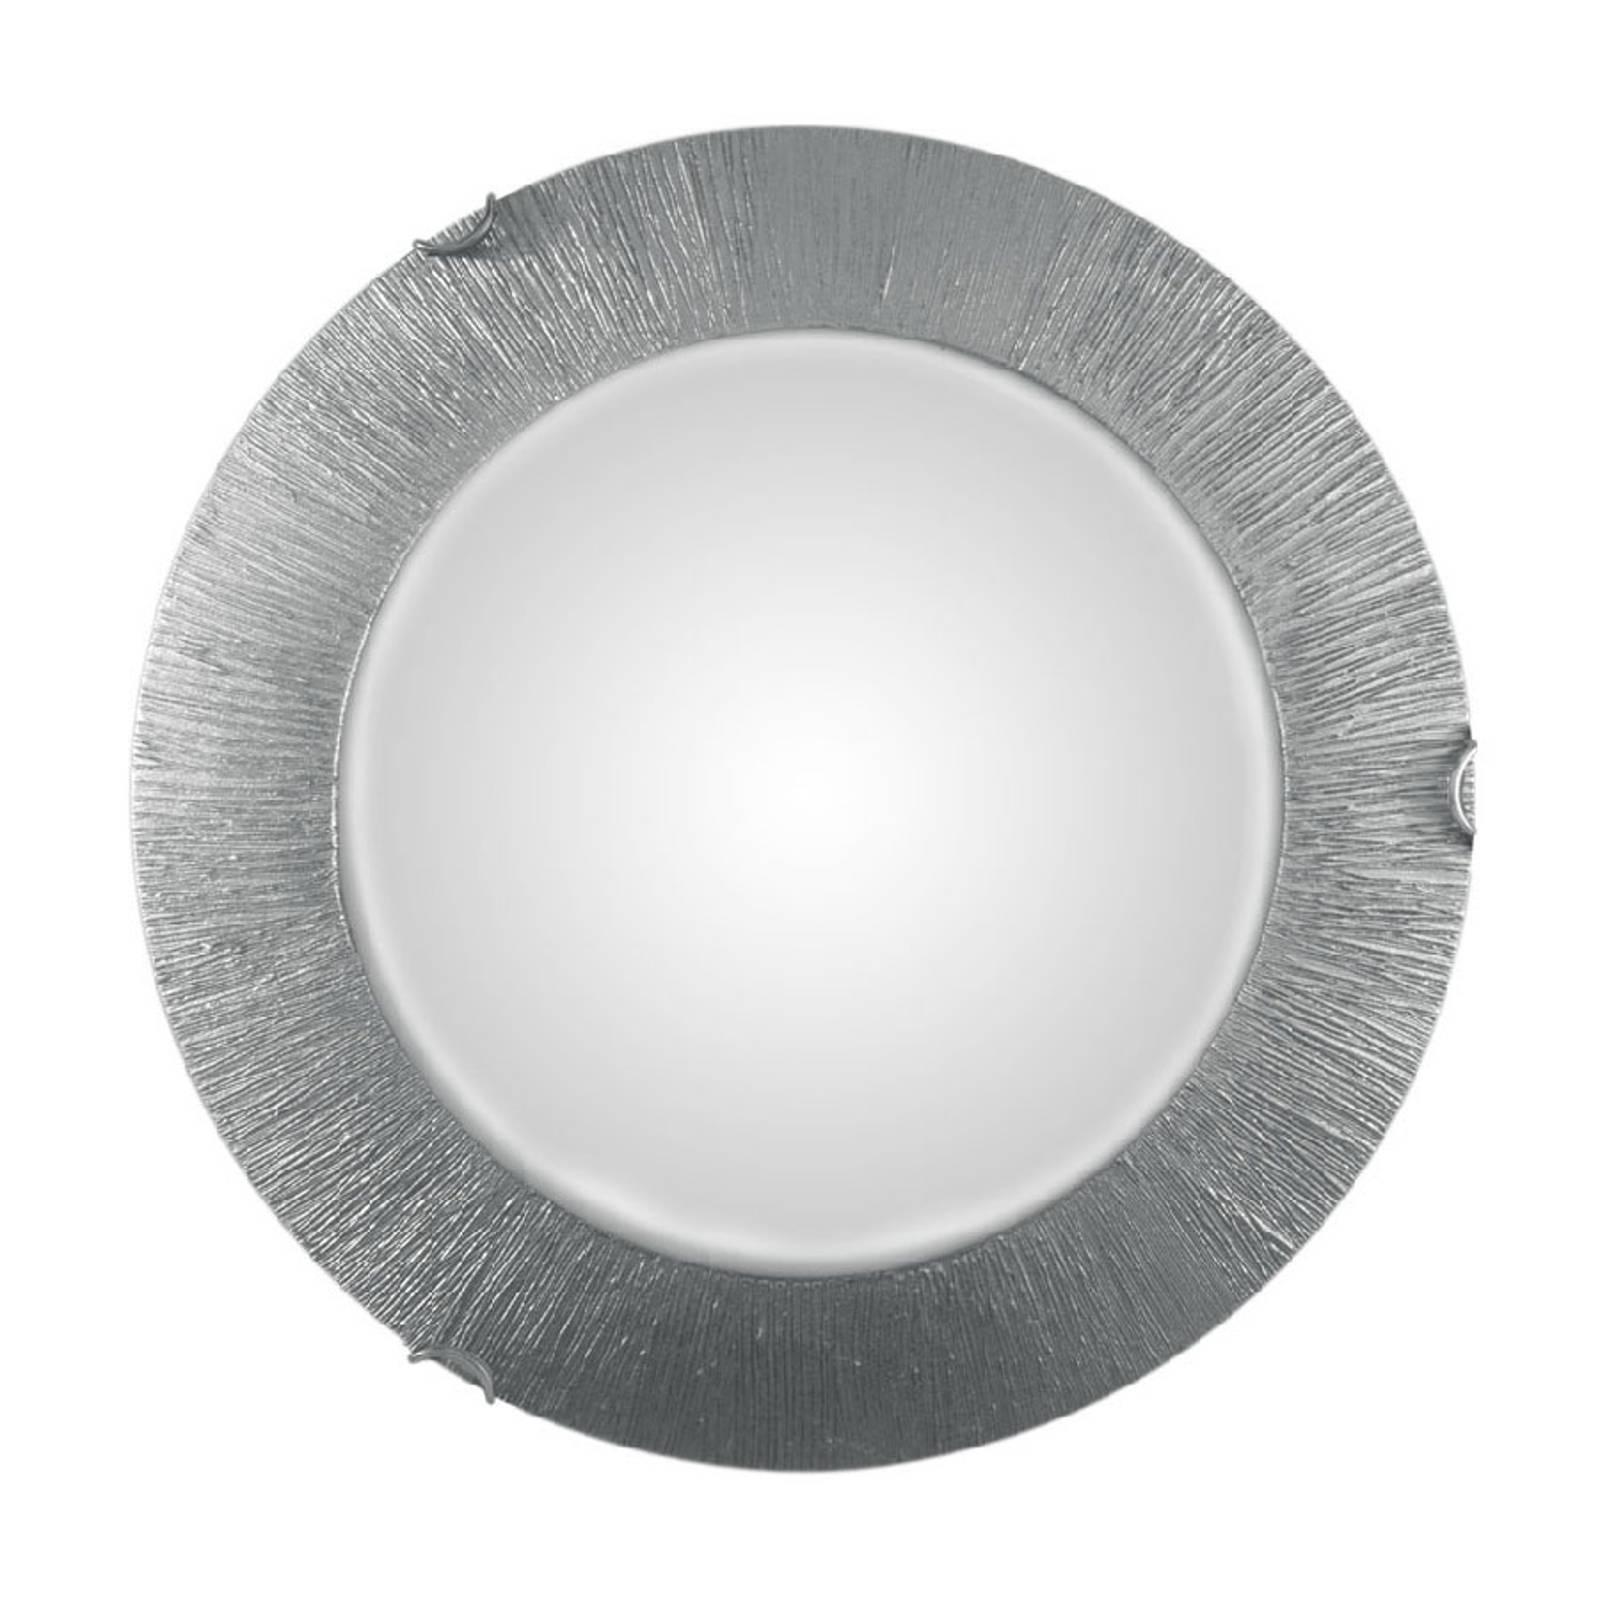 Seinävalaisin Moon Sun, hopea, Ø 40 cm